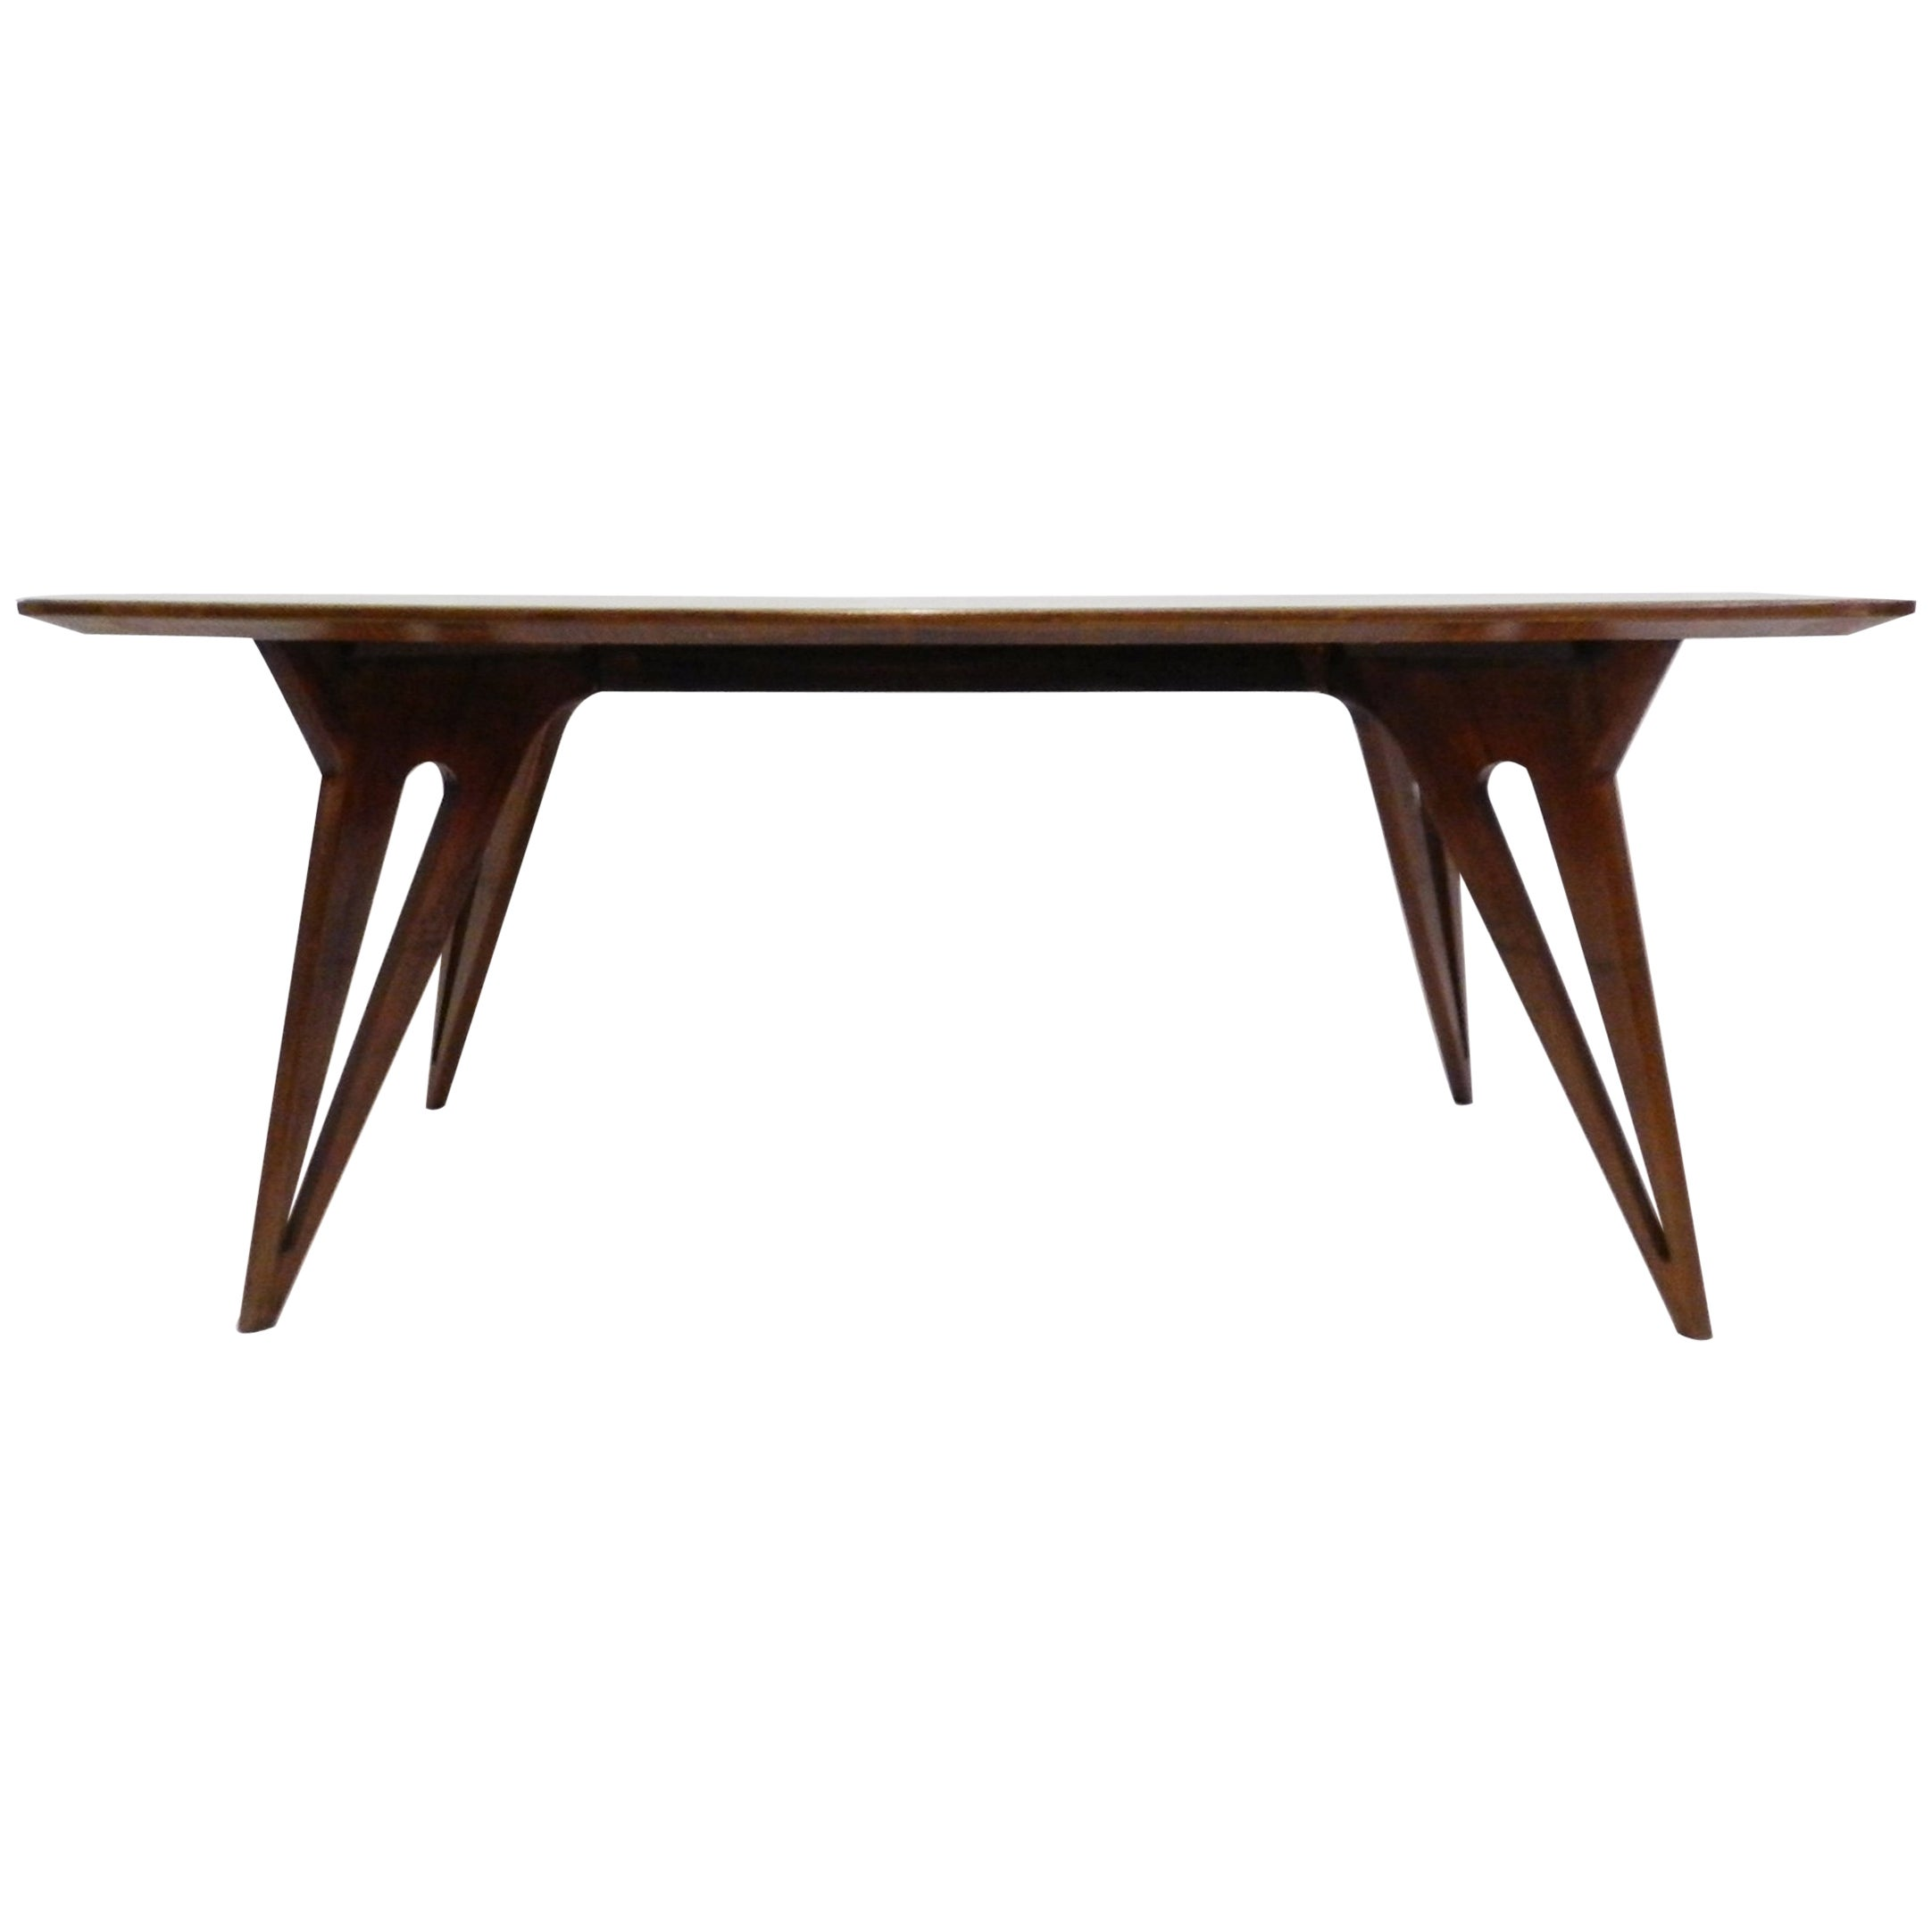 Stunning Italian Dining Table Ico Parisi Style